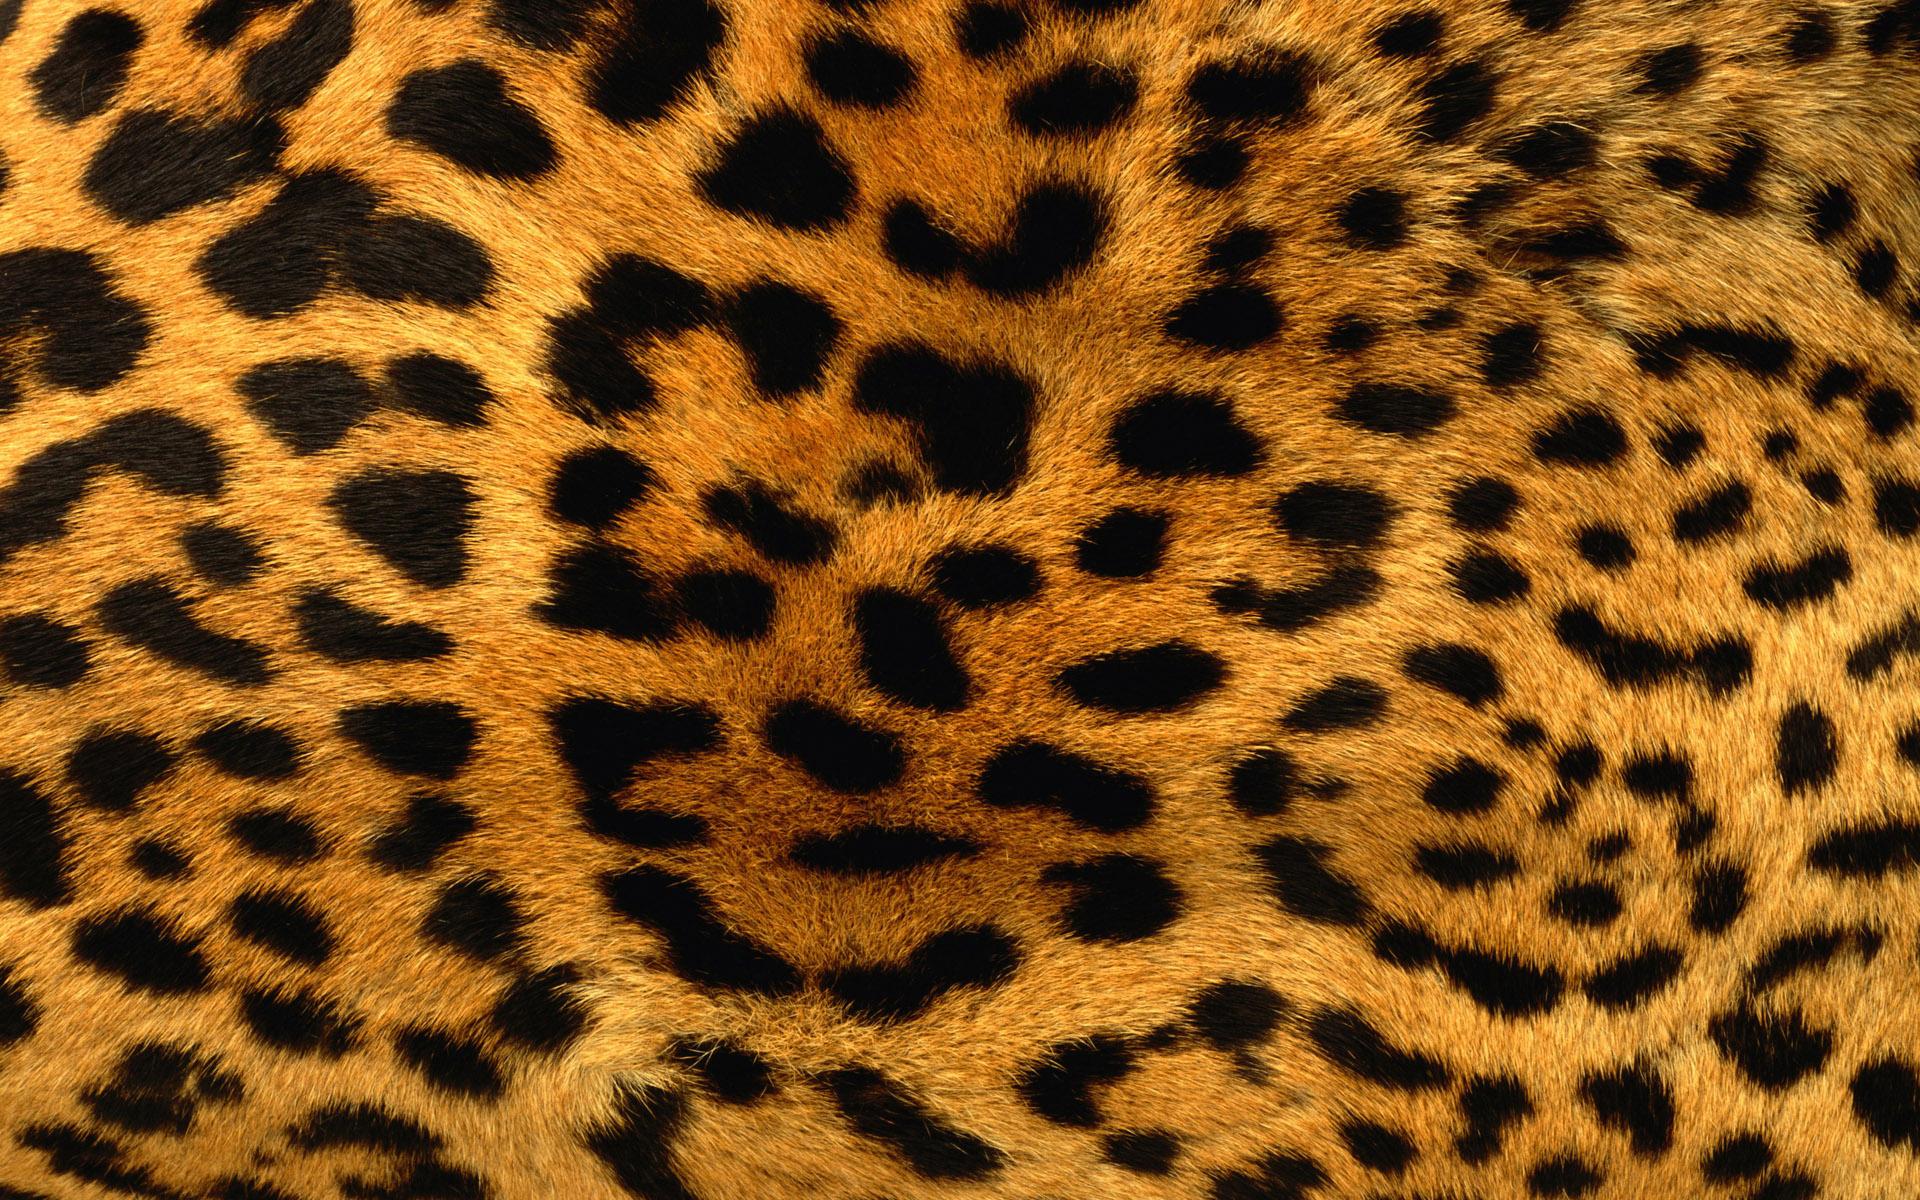 Leopard Background 18395 1920x1080 px